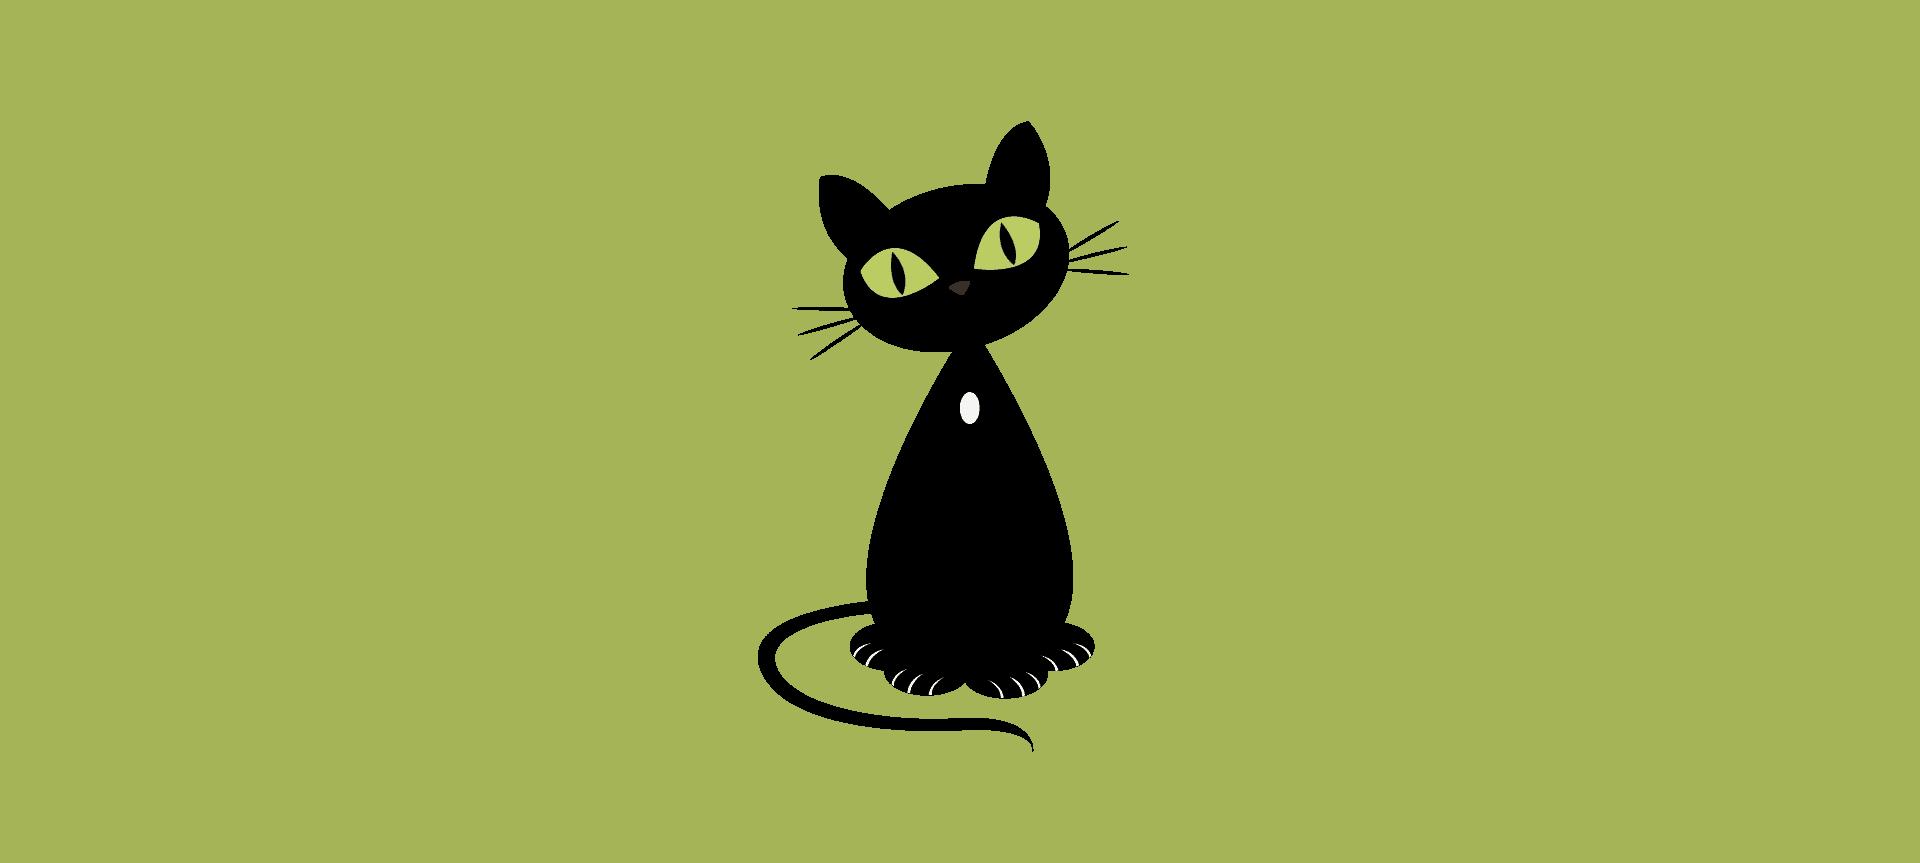 Katze Peggy Headerbild graphic